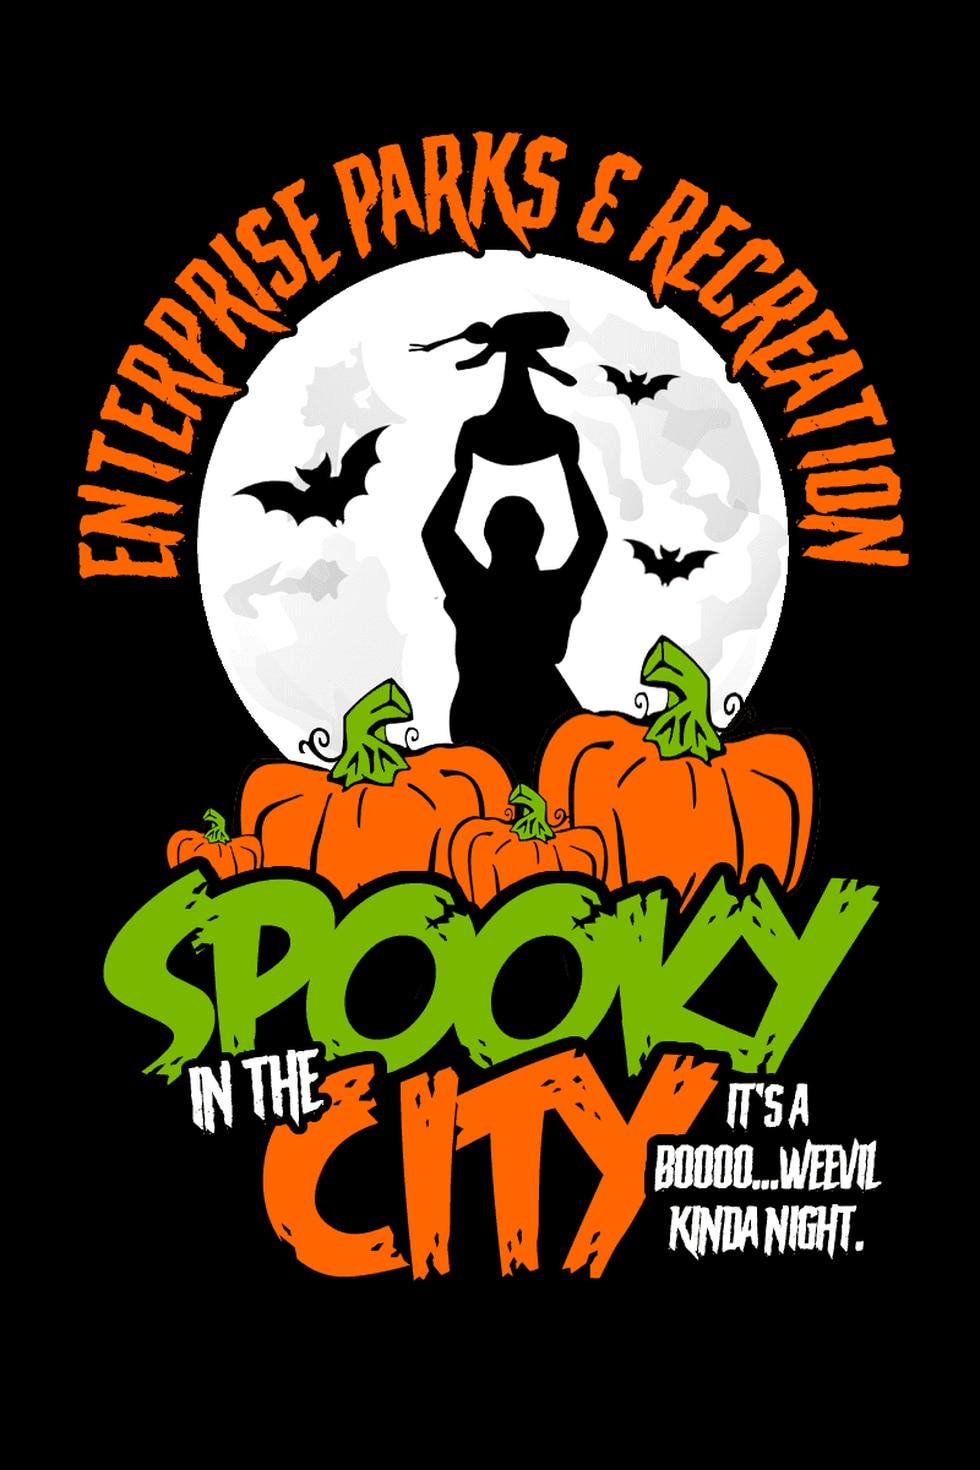 Spooky in the City, Halloween event in Enterprise, Ala.